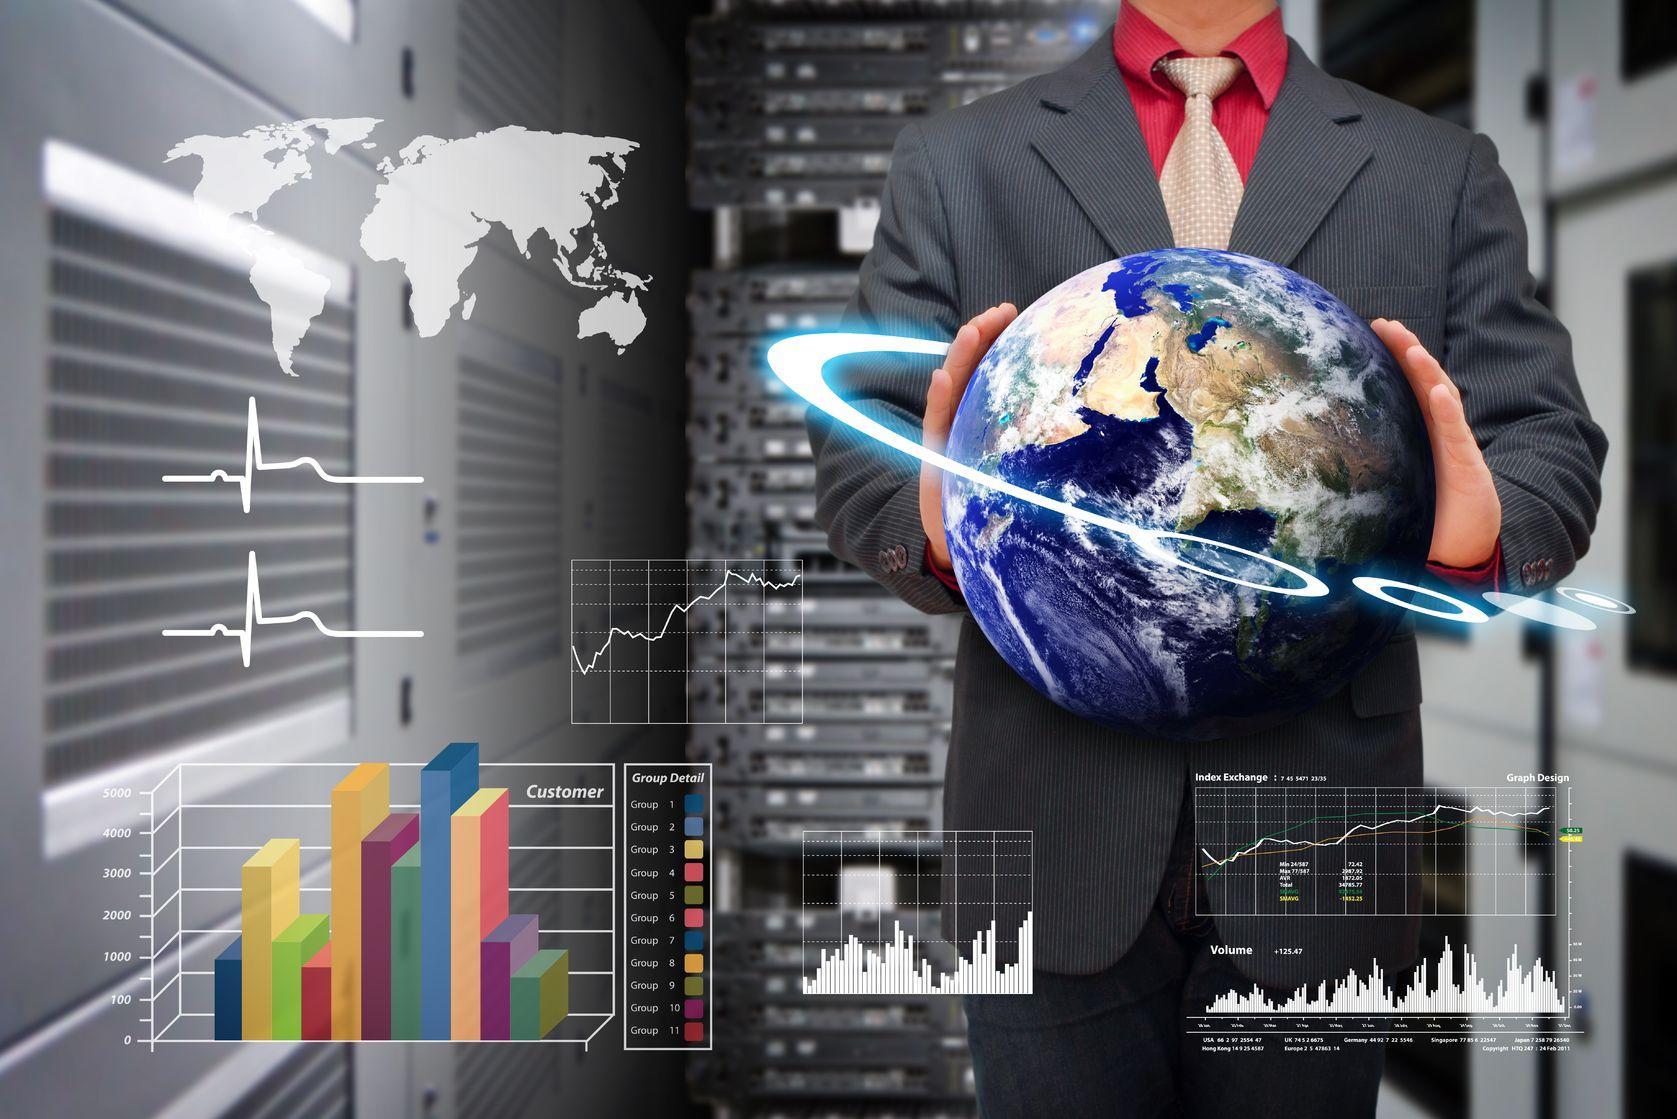 corporate strategy specialist, act consulting, peran strategi untuk meningkatkan profit korporasi